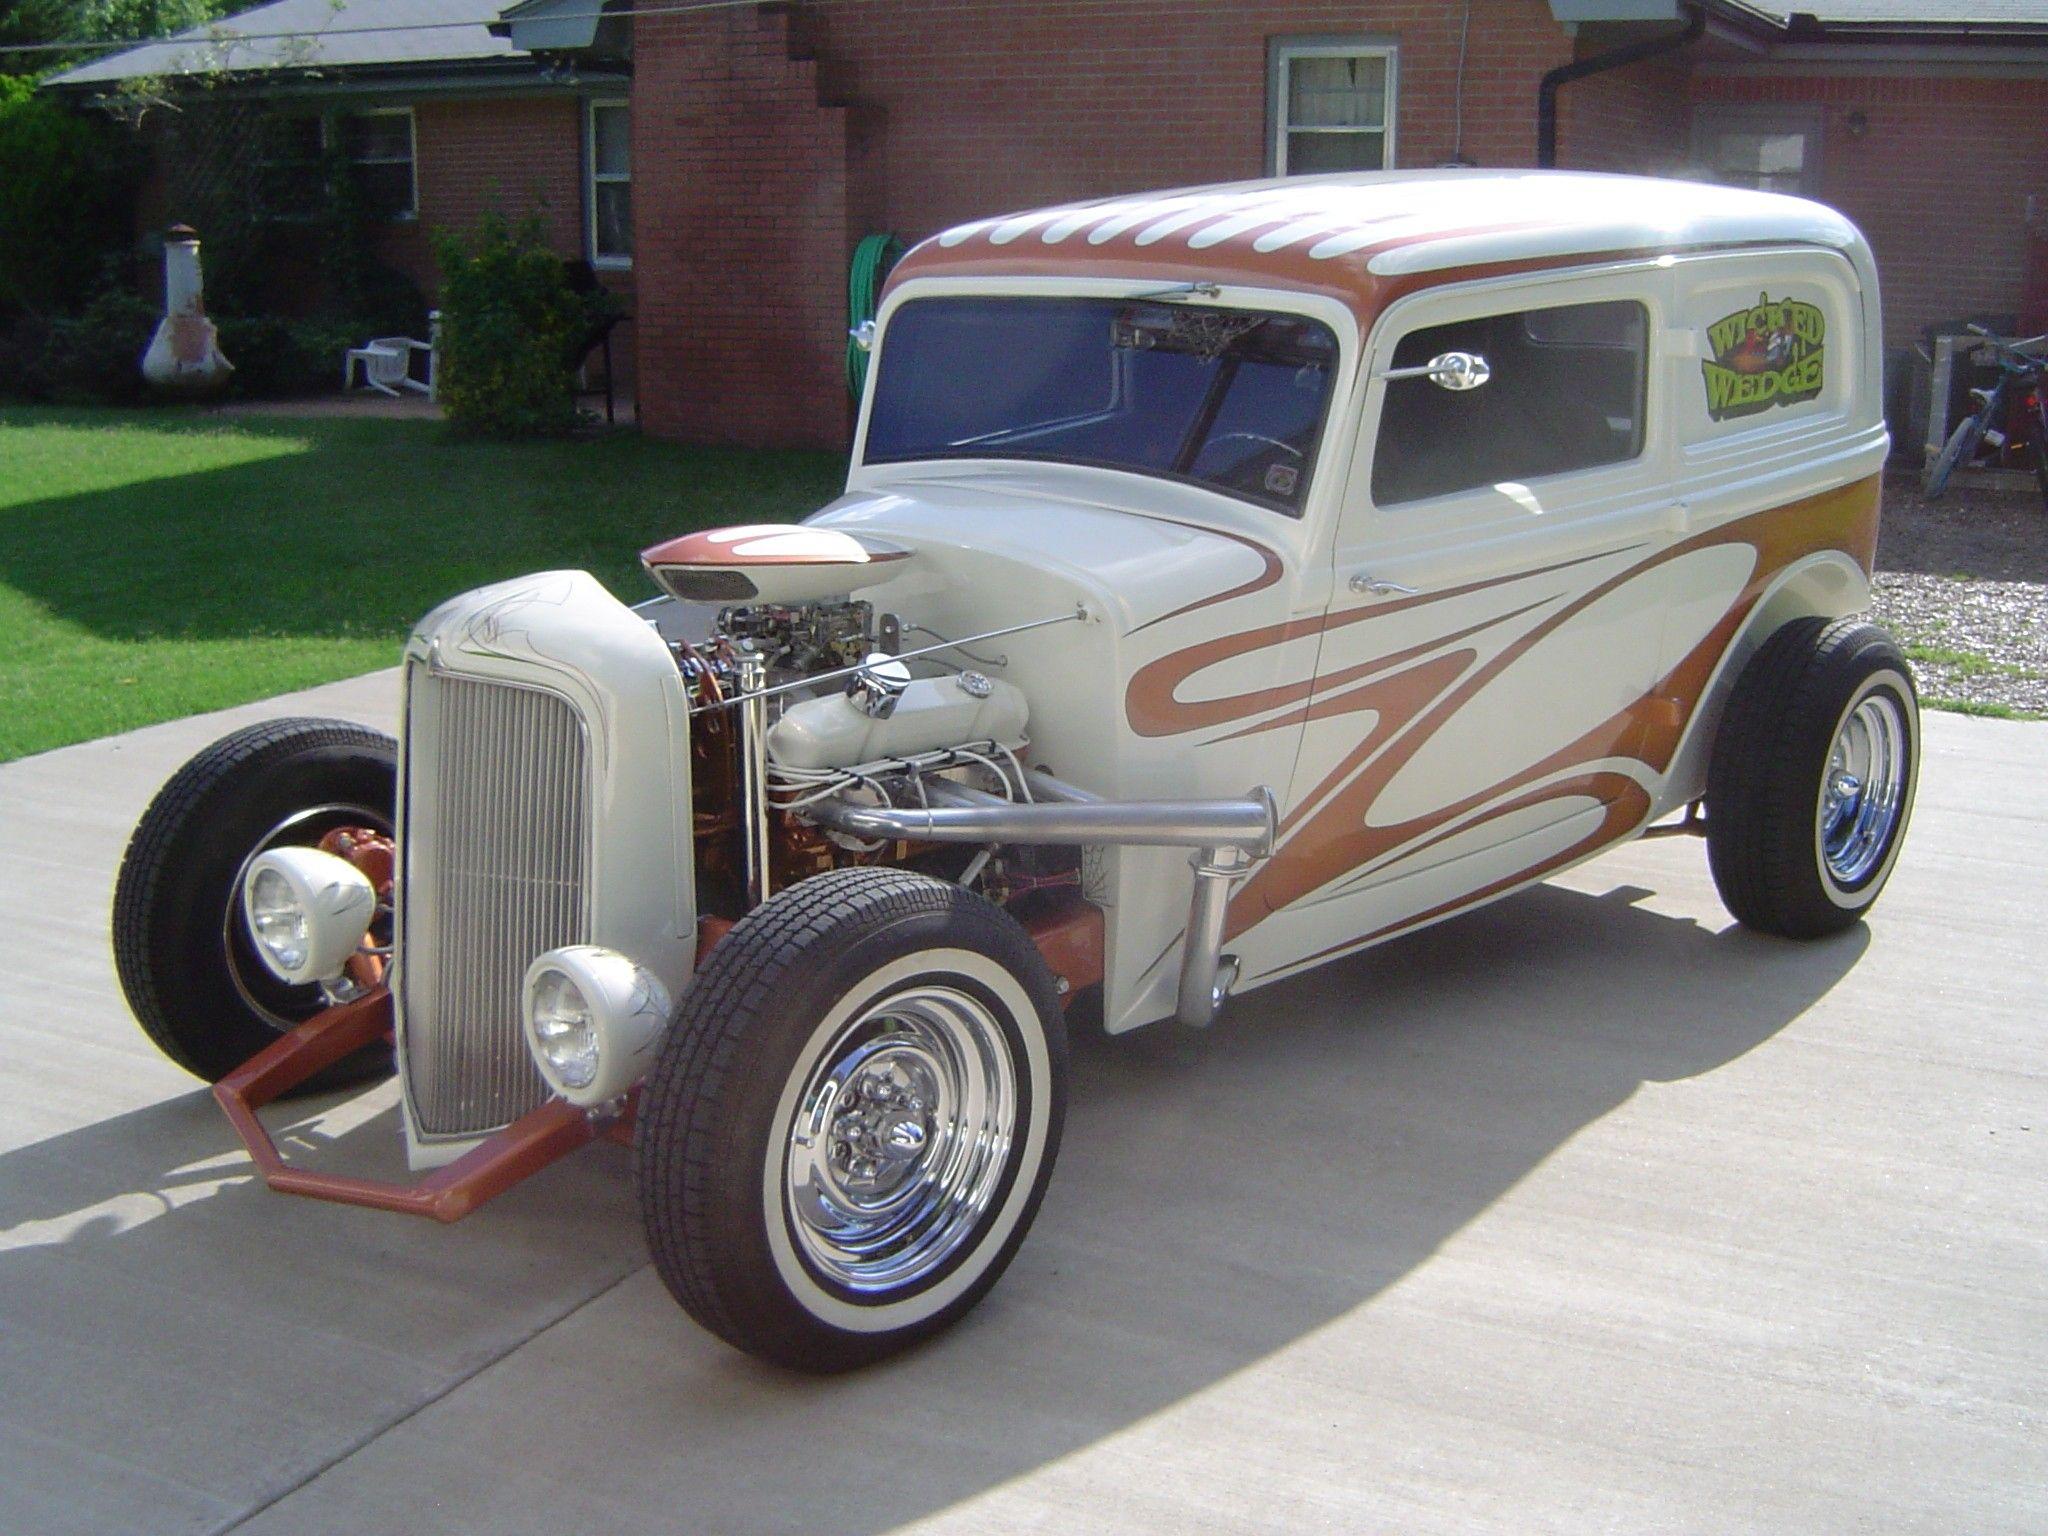 Motor\'n New | For sale 1934 Custom Plymouth Hi-Boy Sedan Street ...